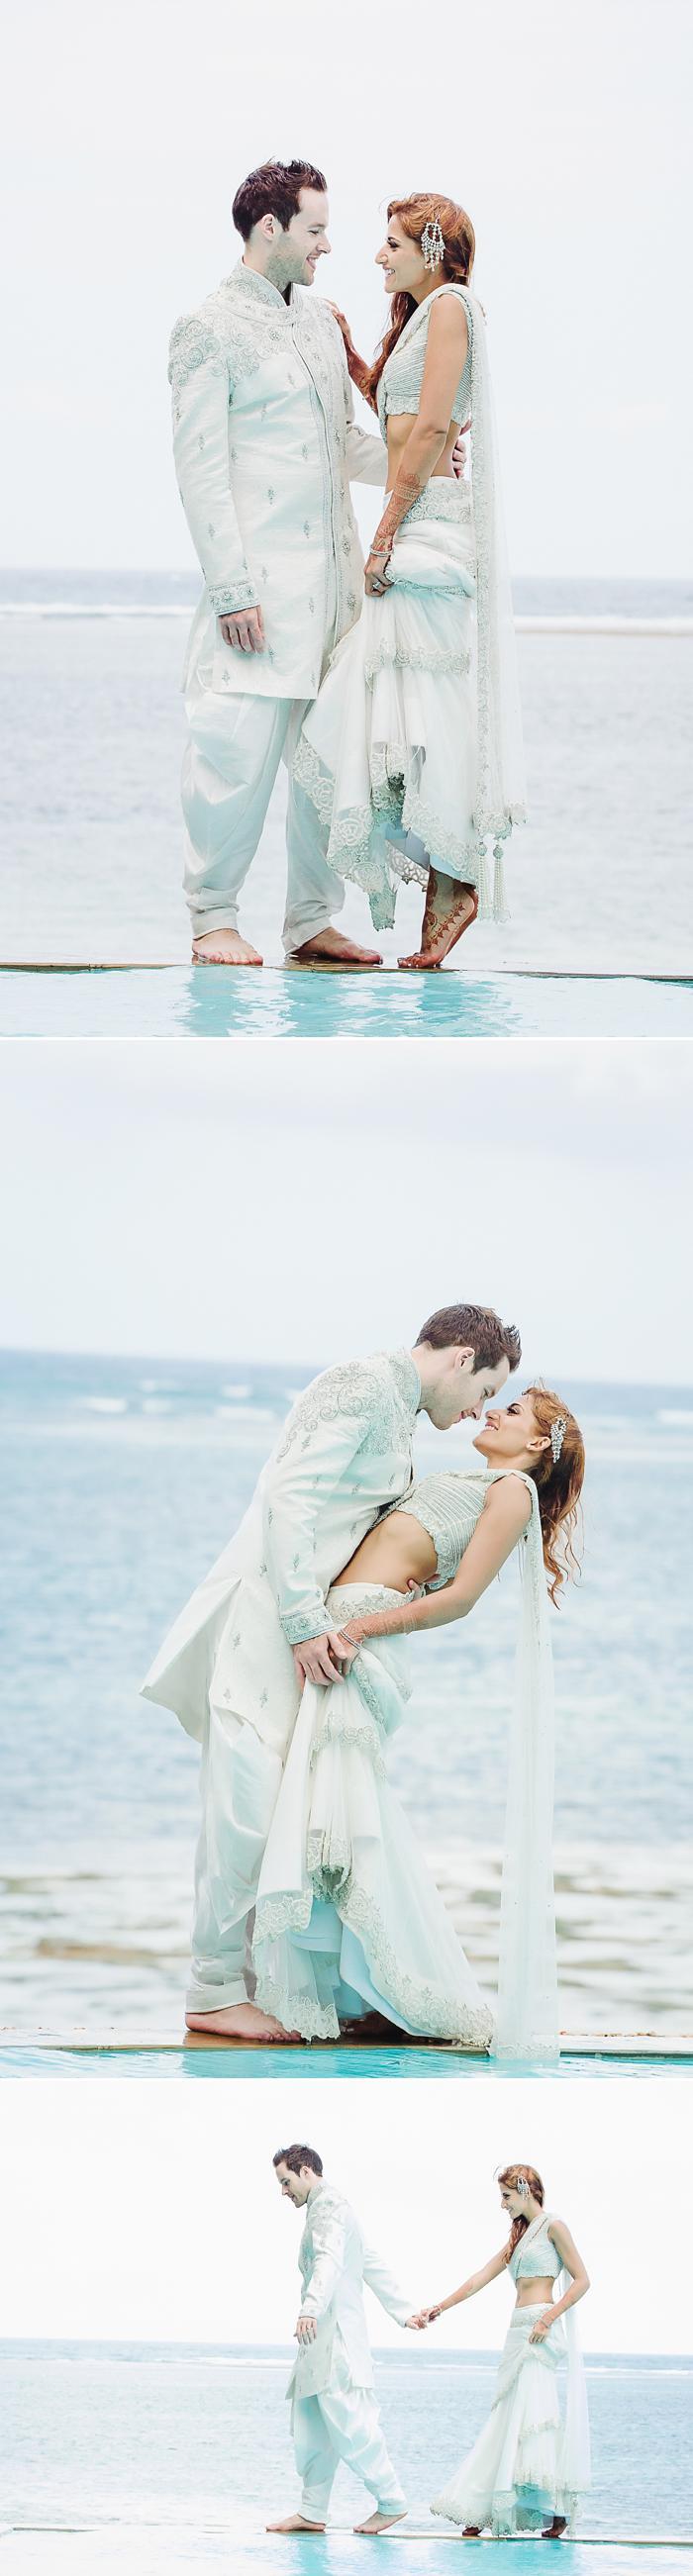 Wedding Photographer Diani Beach Mombasa Kenya Zanzibar.jpg